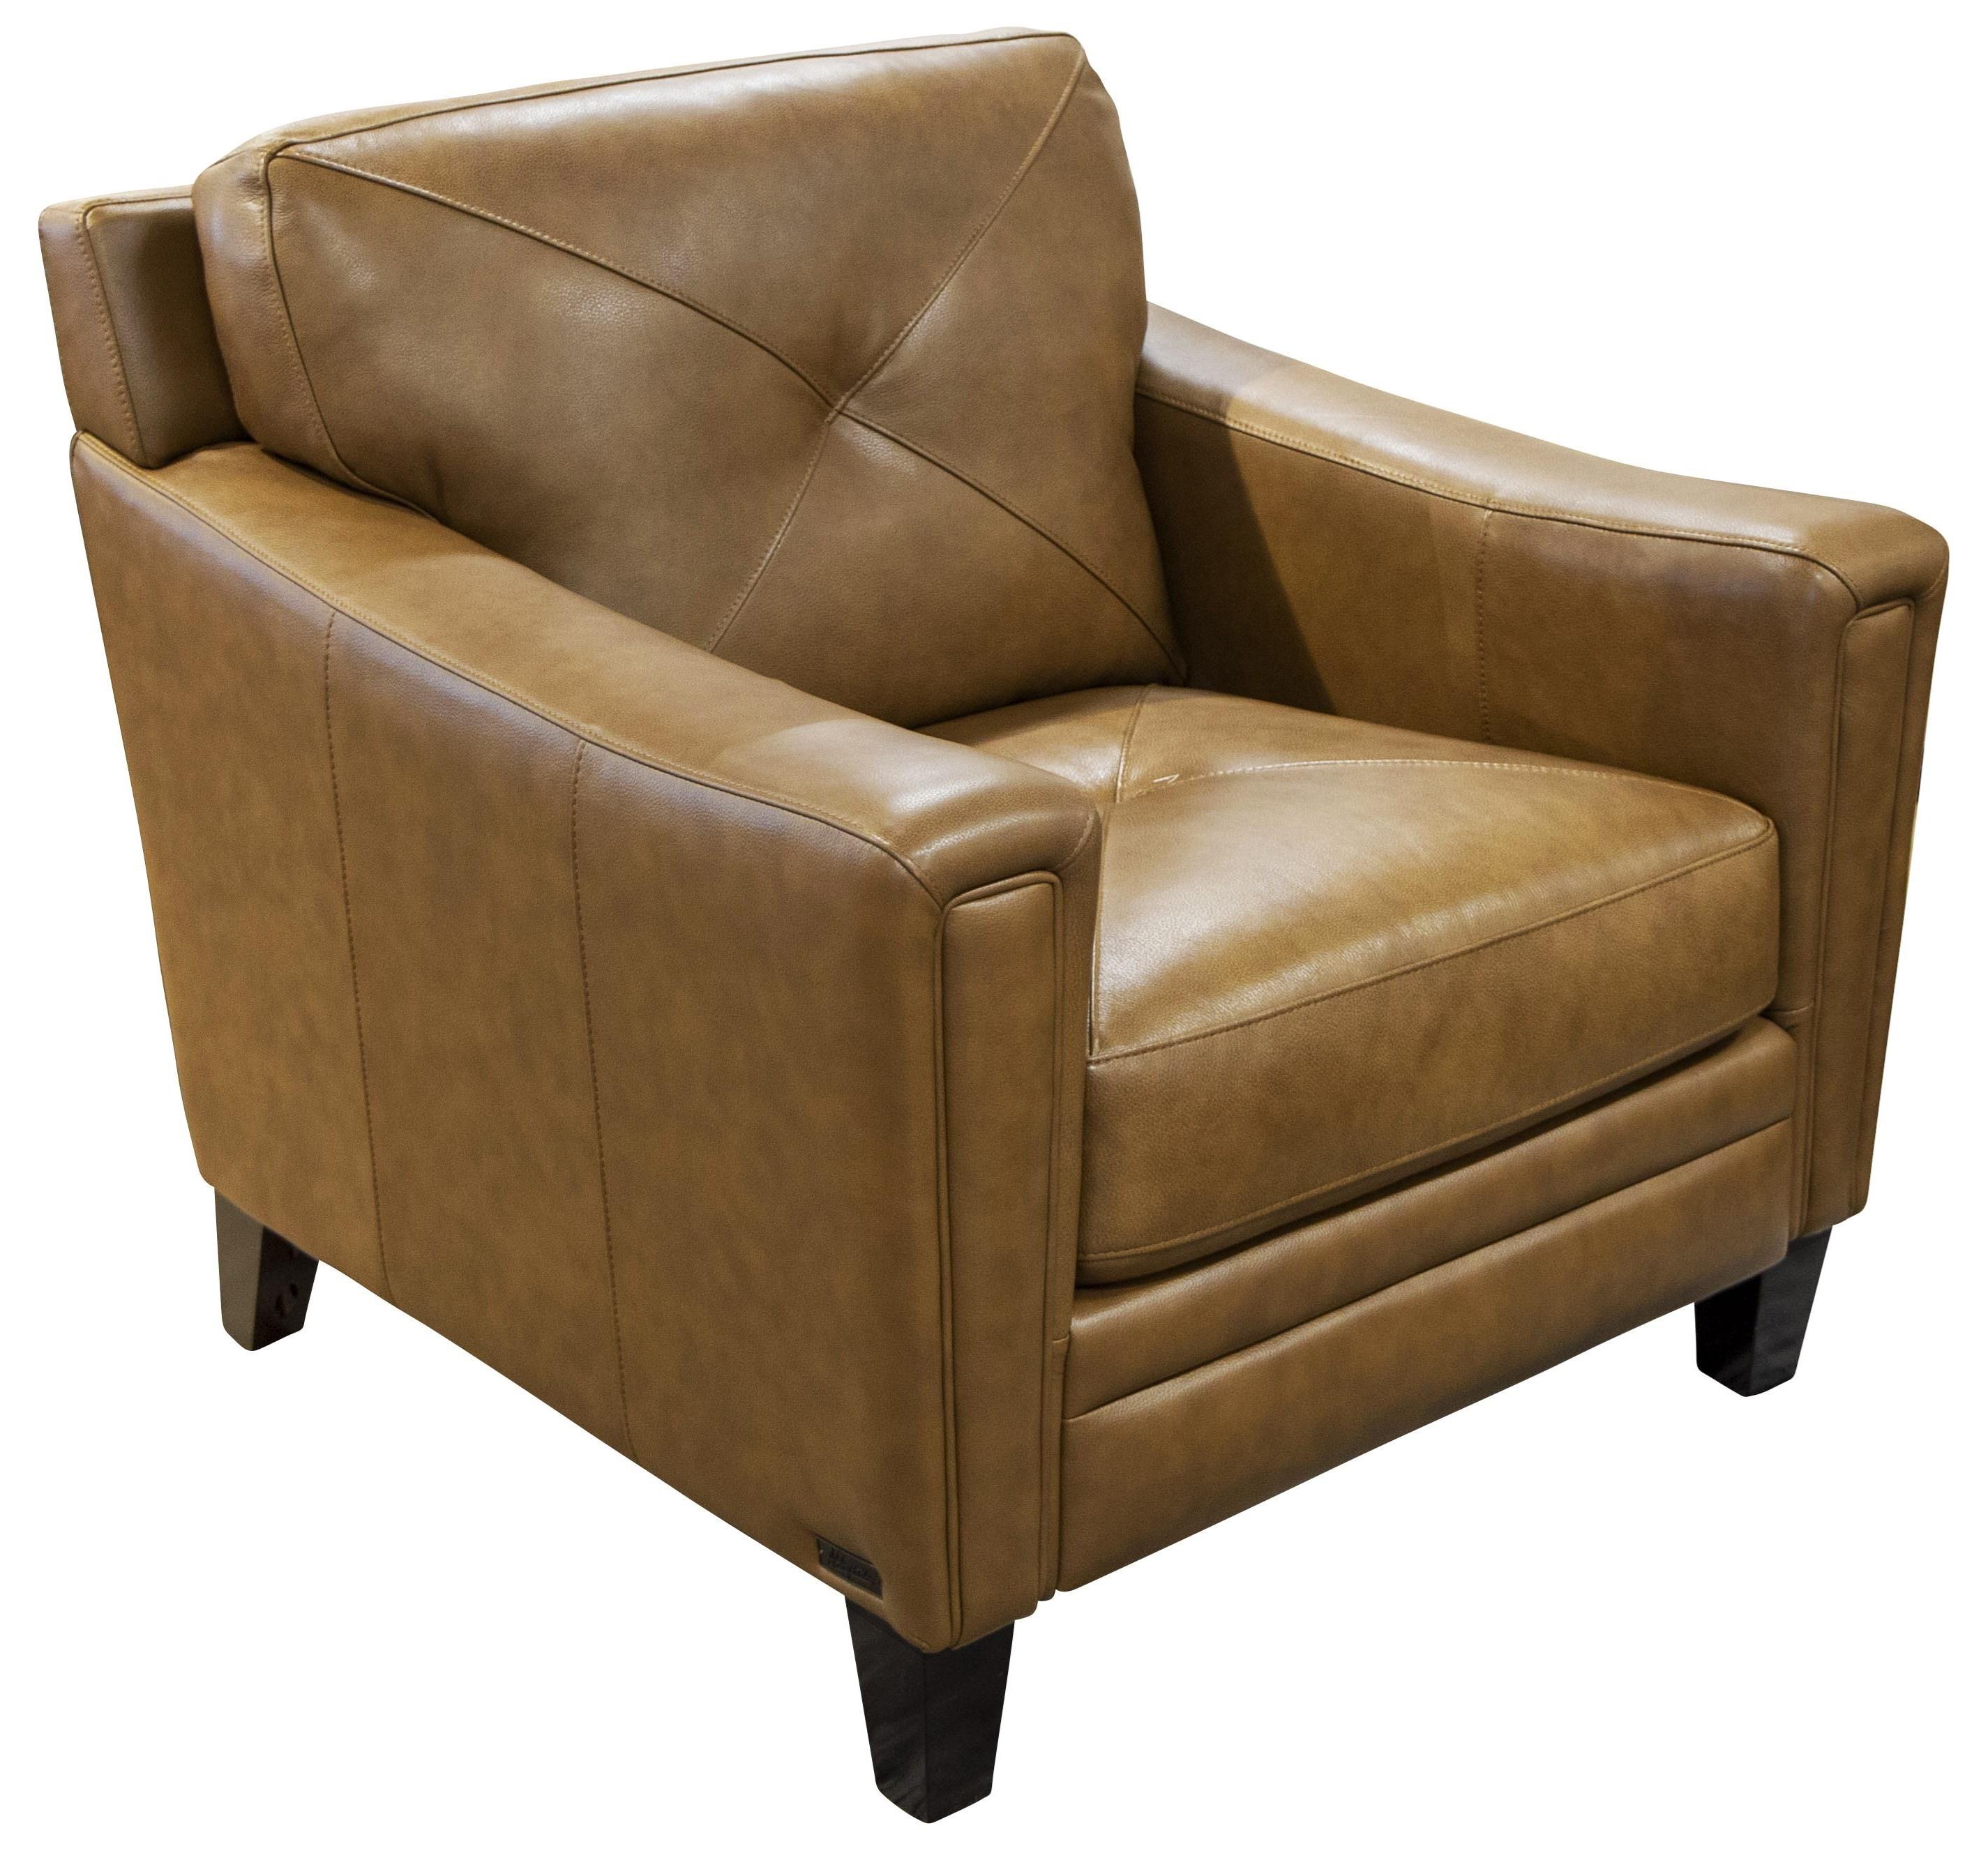 Wren Wren Leather Match Chair by Abbyson at Morris Home